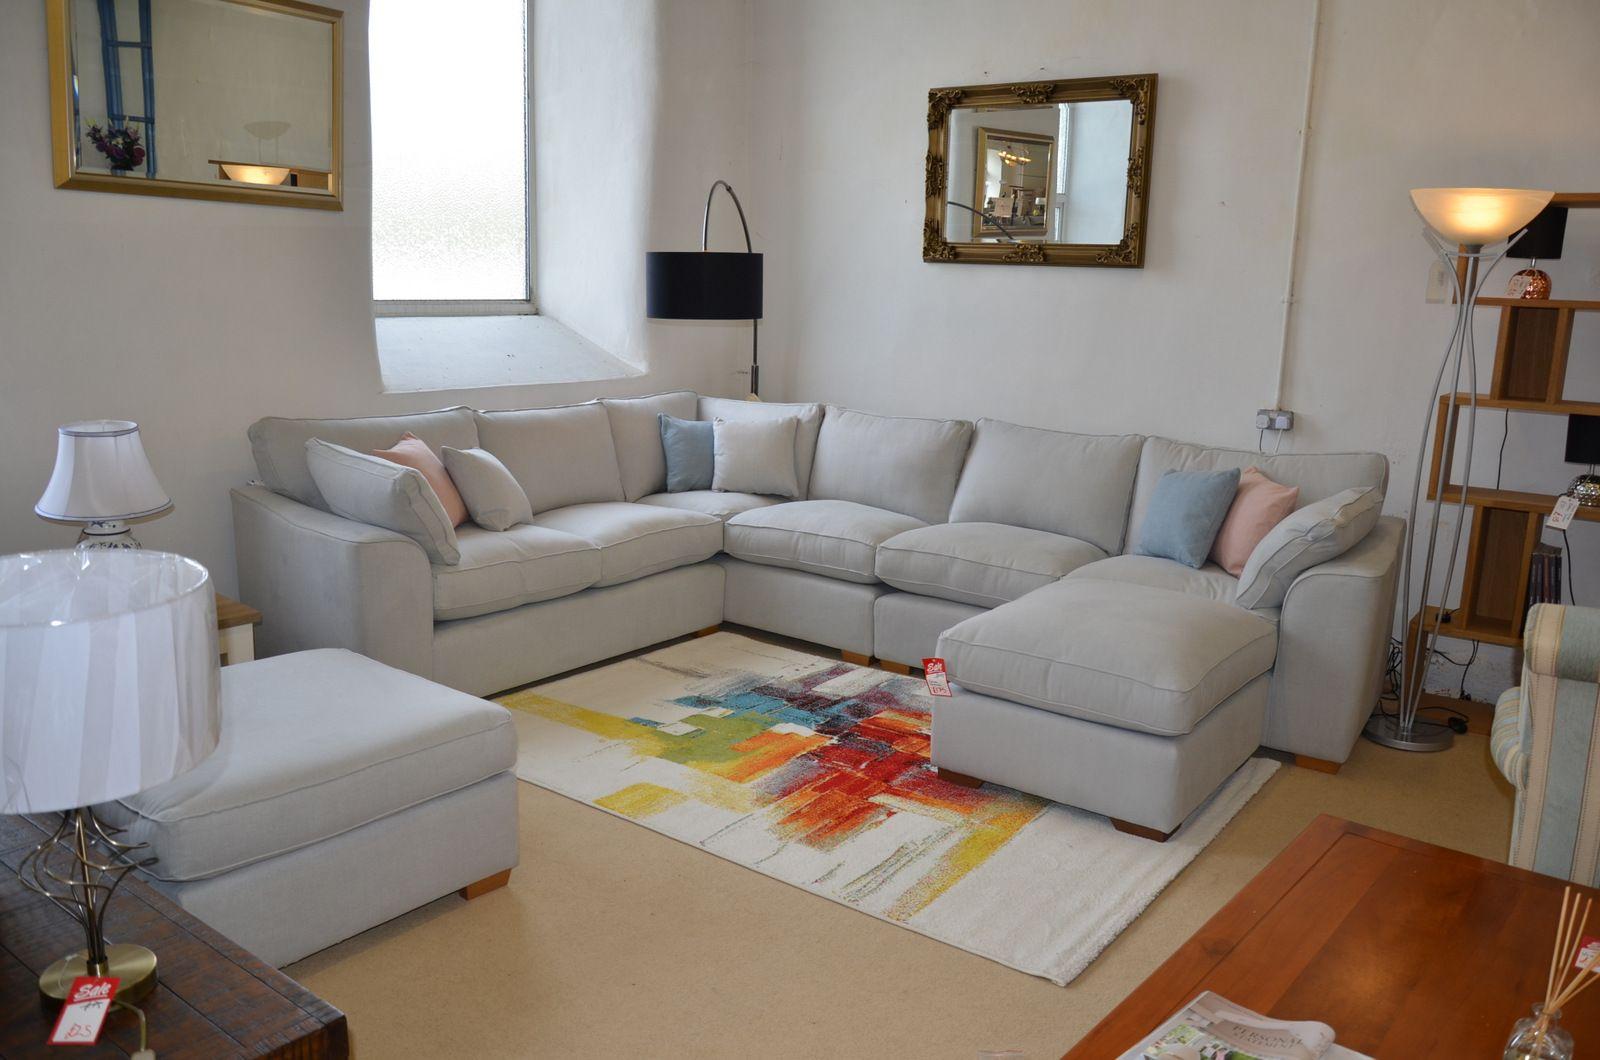 Terrific Jude Large Corner Sofa In Soft Blue Grey And Pastel Fabrics Interior Design Ideas Skatsoteloinfo